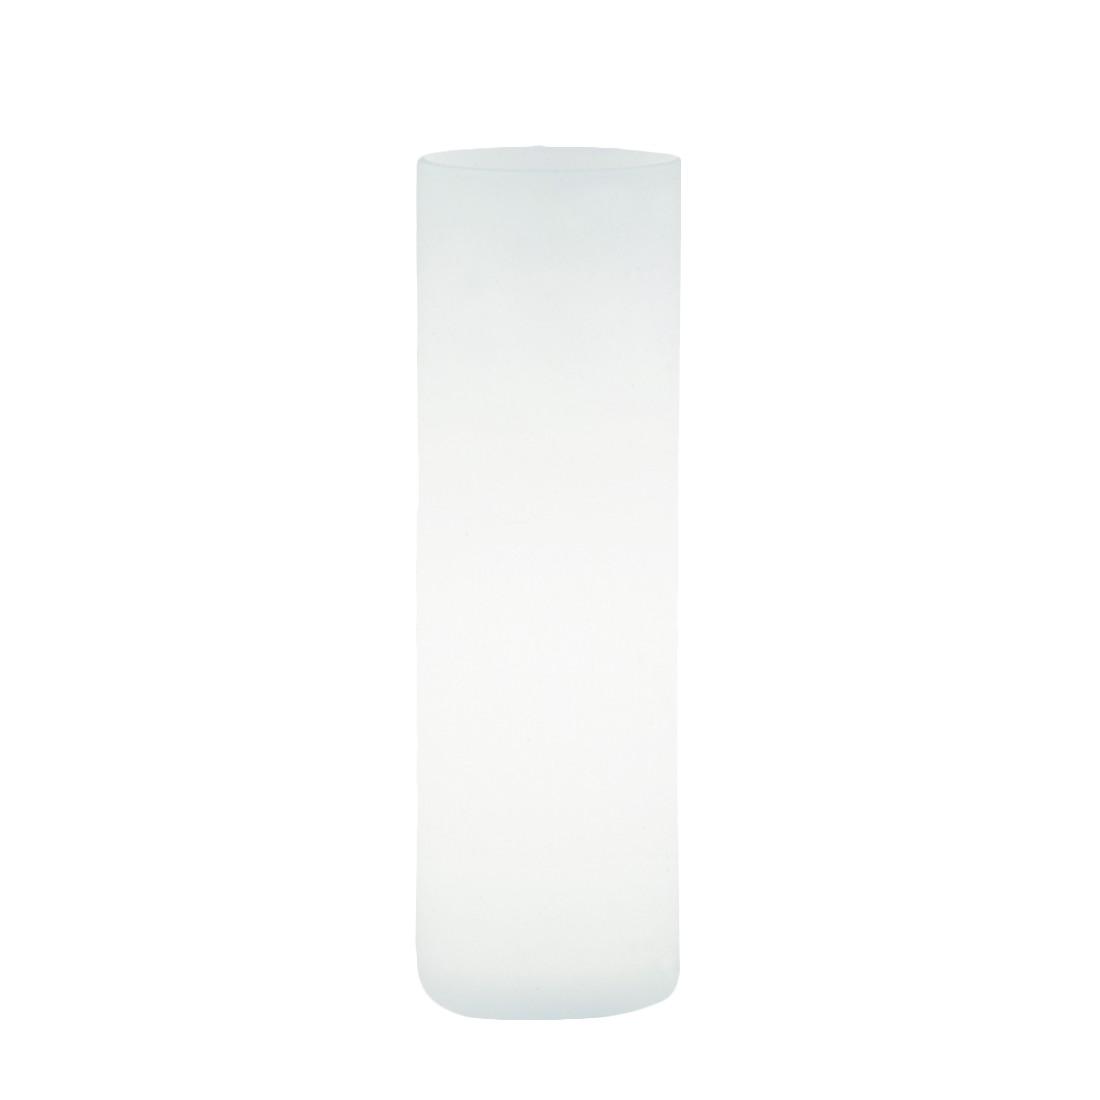 energie  A++, Tafellamp CYLINDERE - metaal/glas 1 lichtbron, Wofi